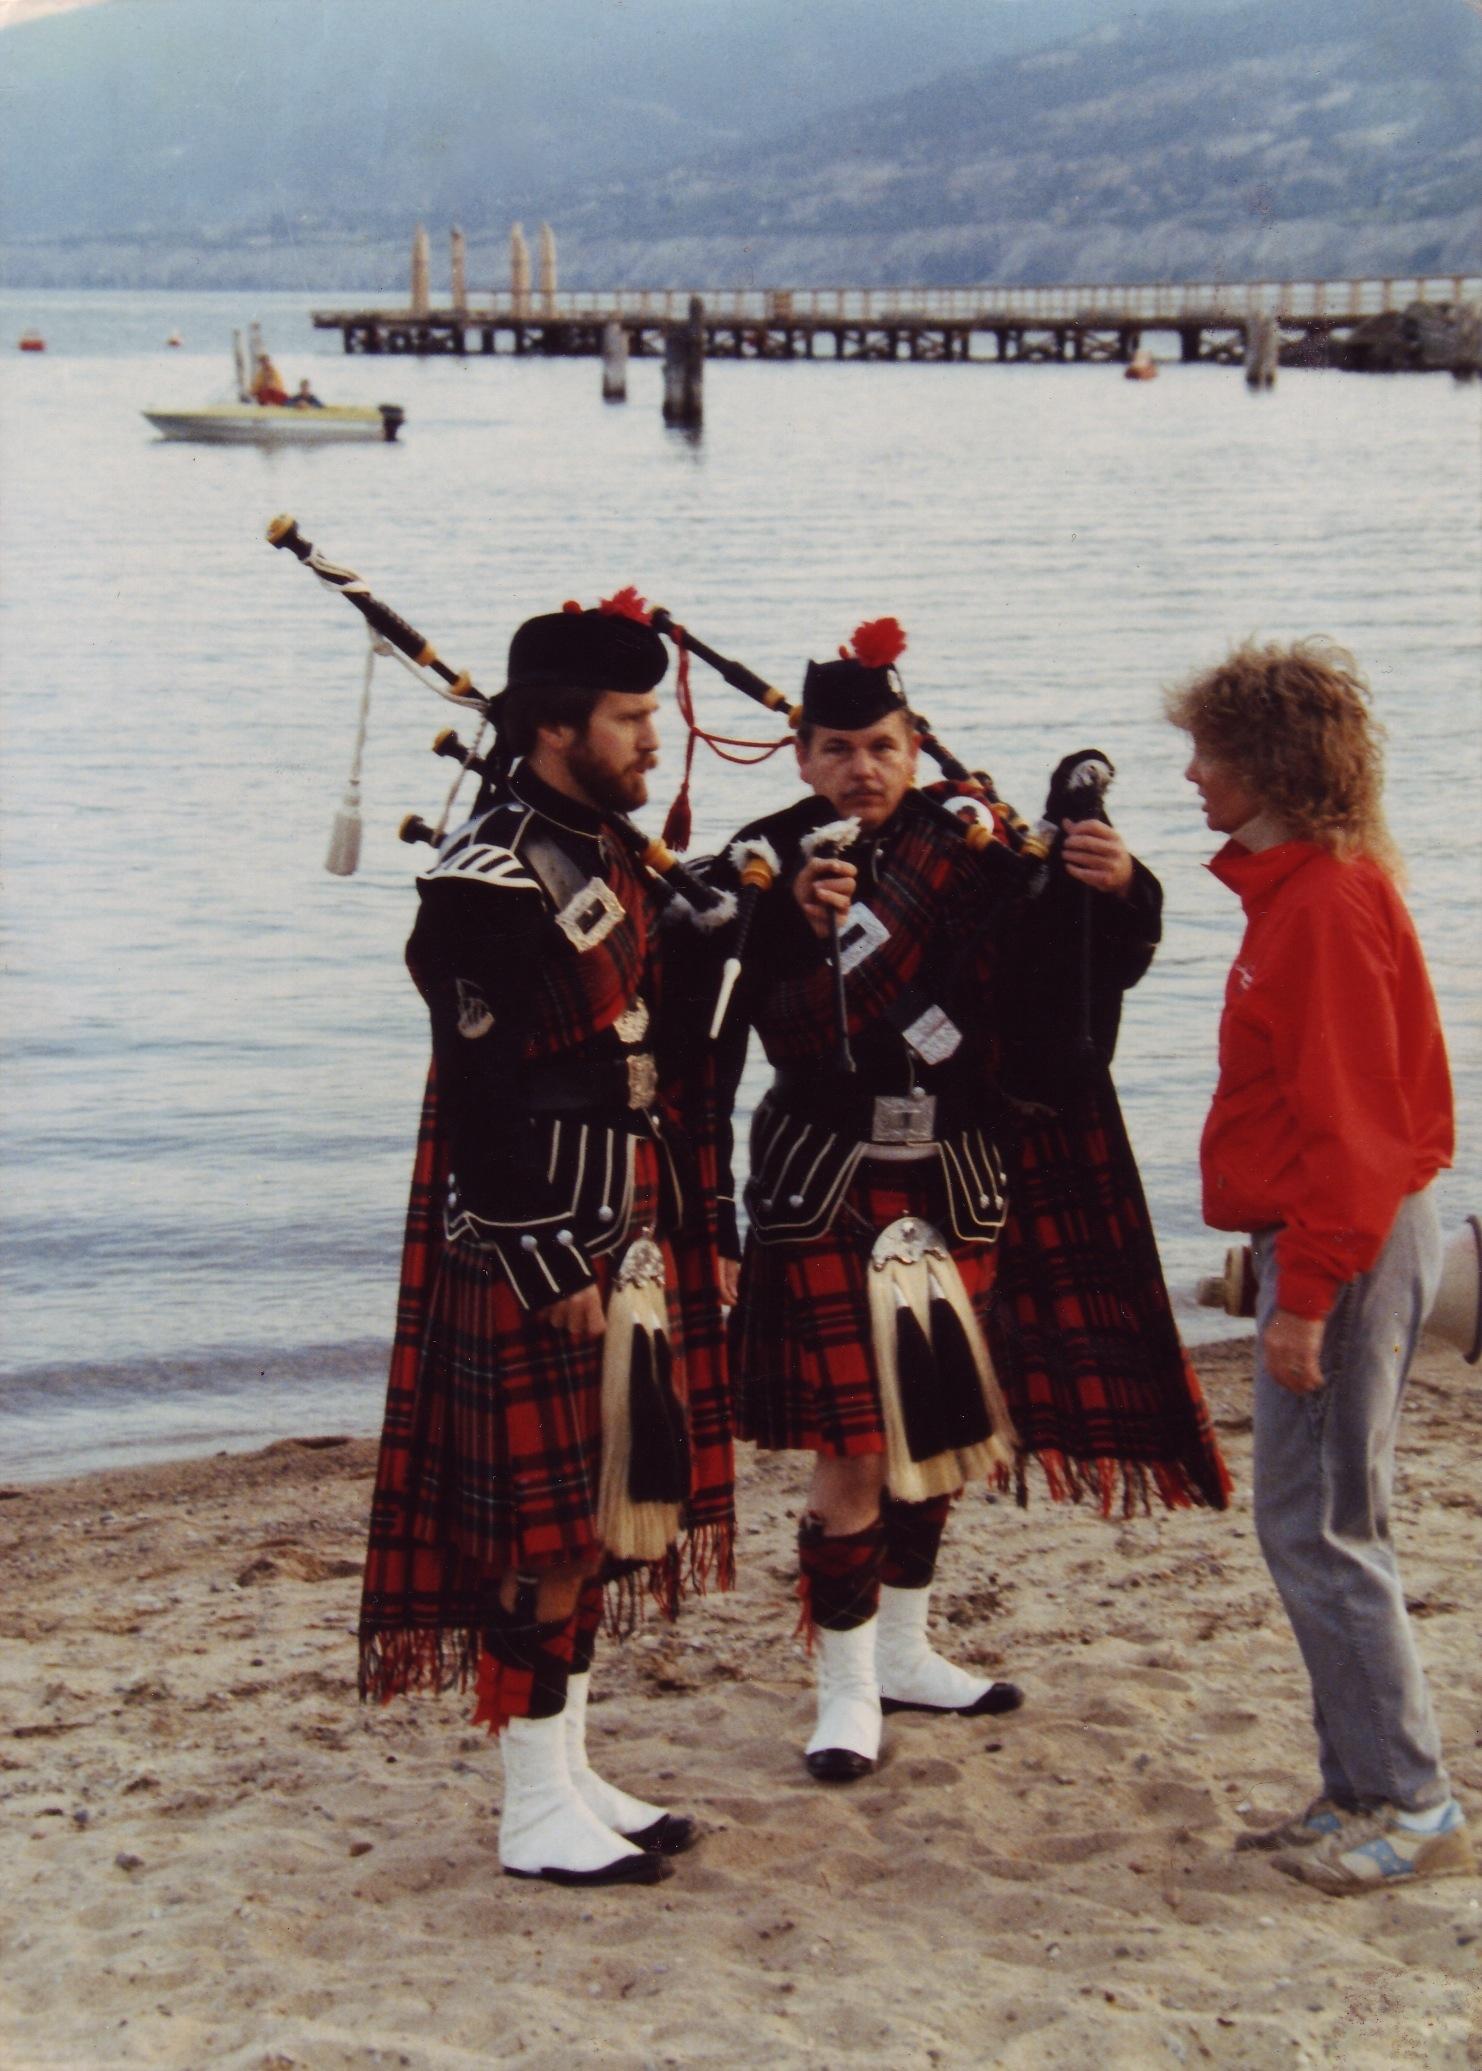 Lynn directing Penticton Pipe Band members at the swim start, 1984.